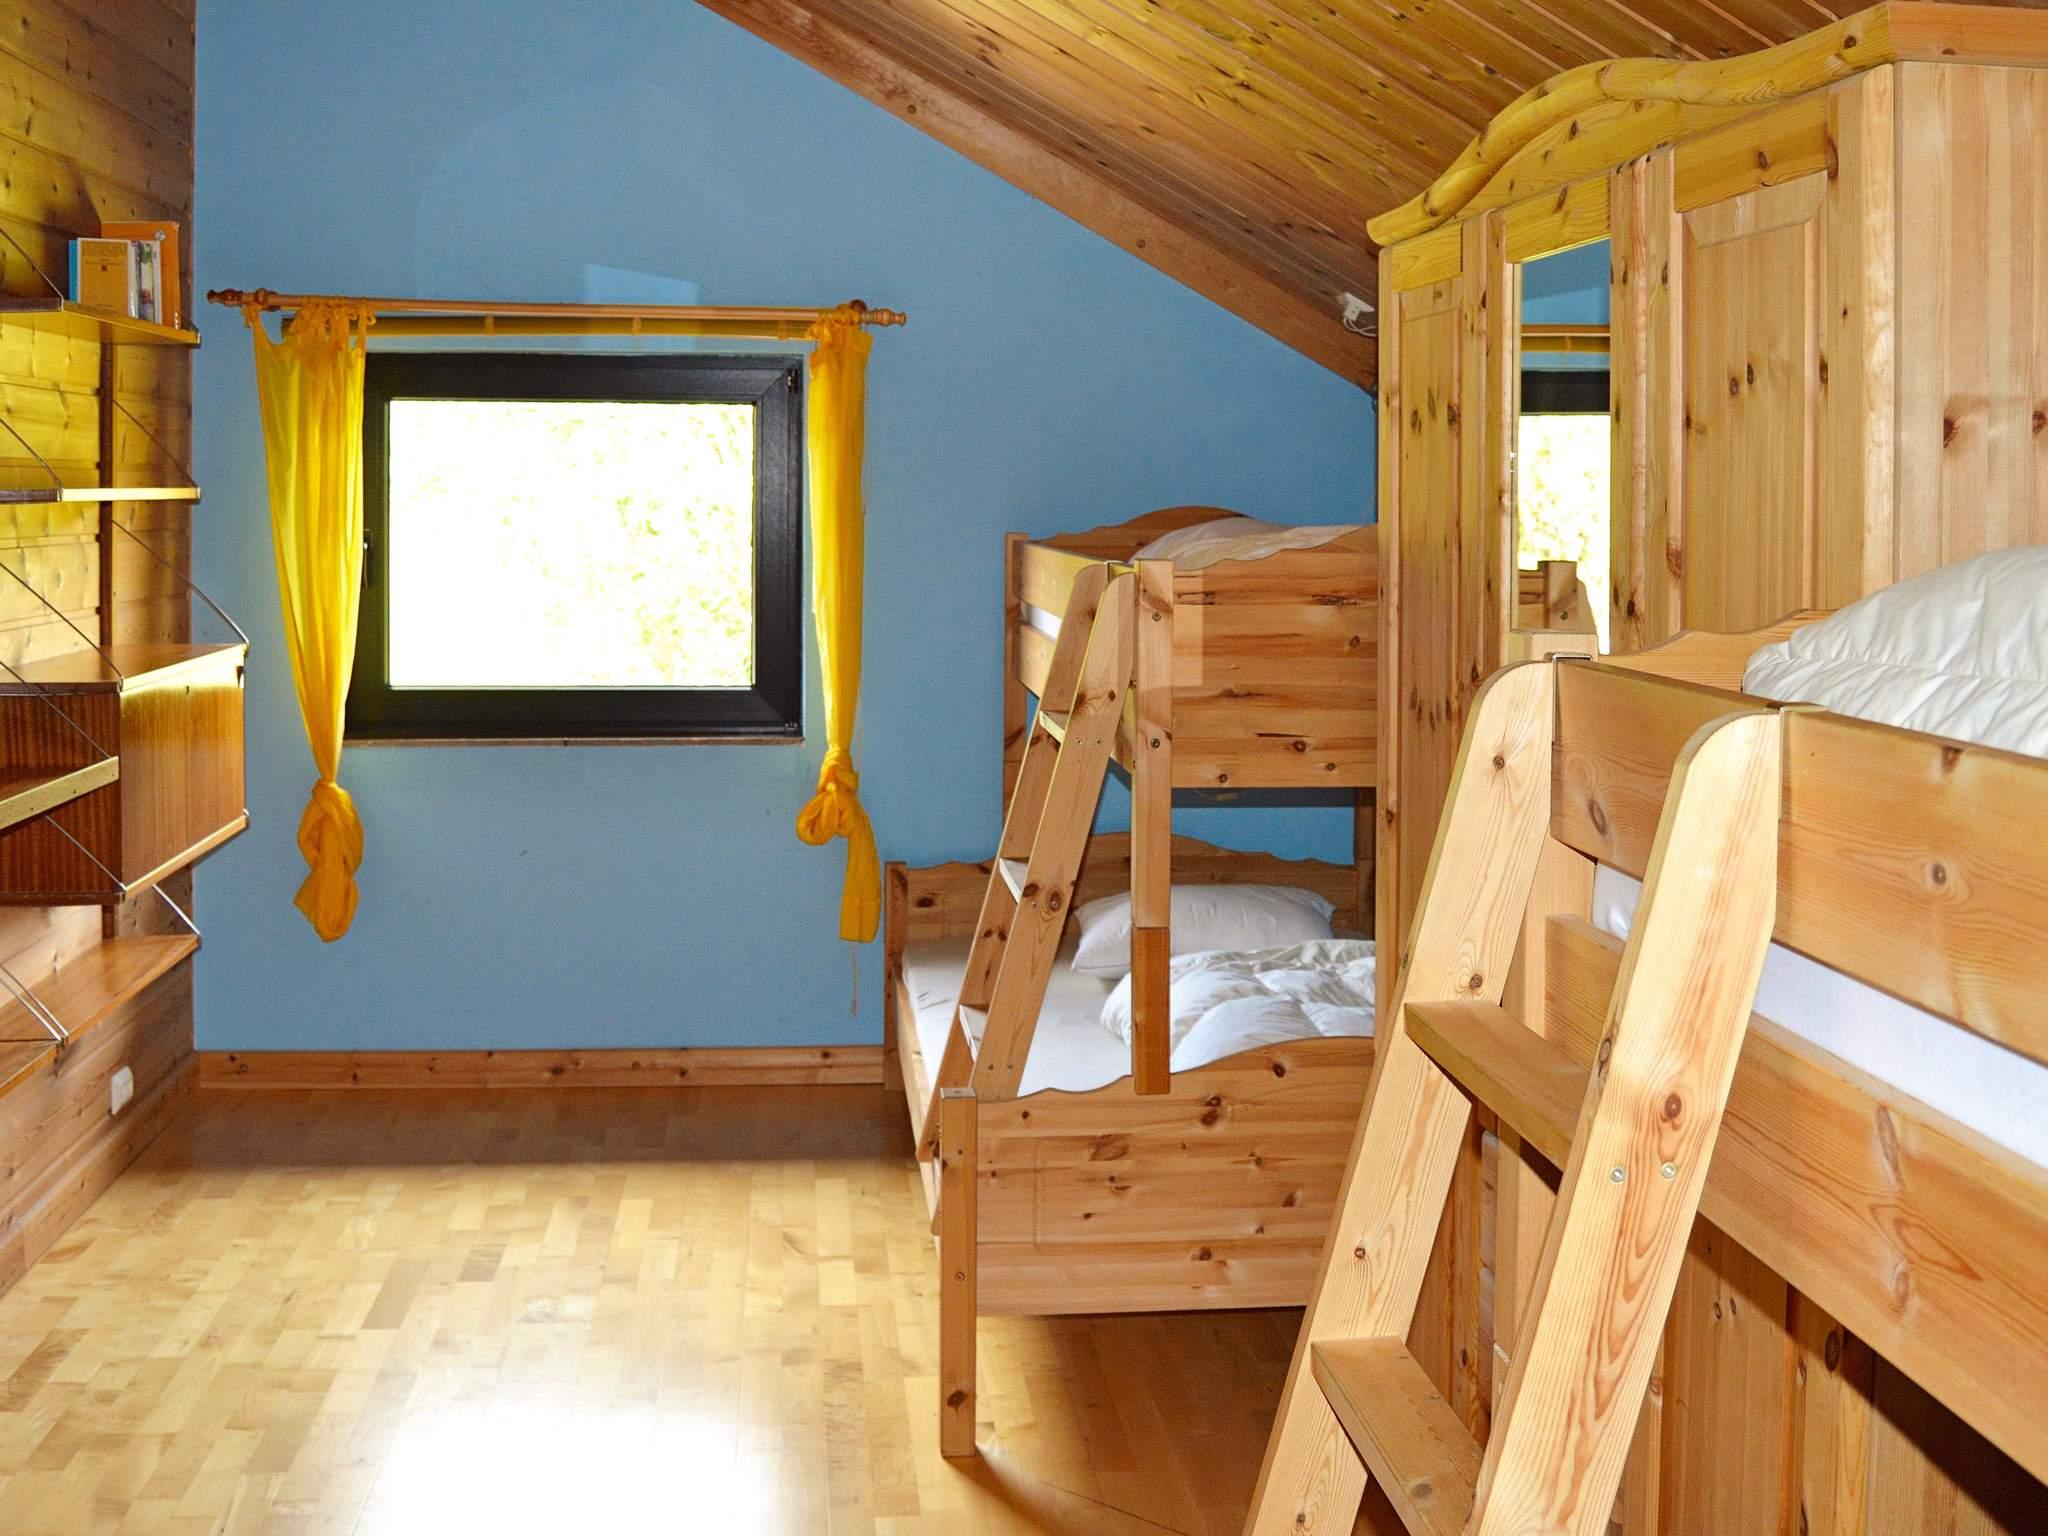 Ferienhaus Eidsvåg (84695), Eidsvåg, More - Romsdal, Westnorwegen, Norwegen, Bild 19